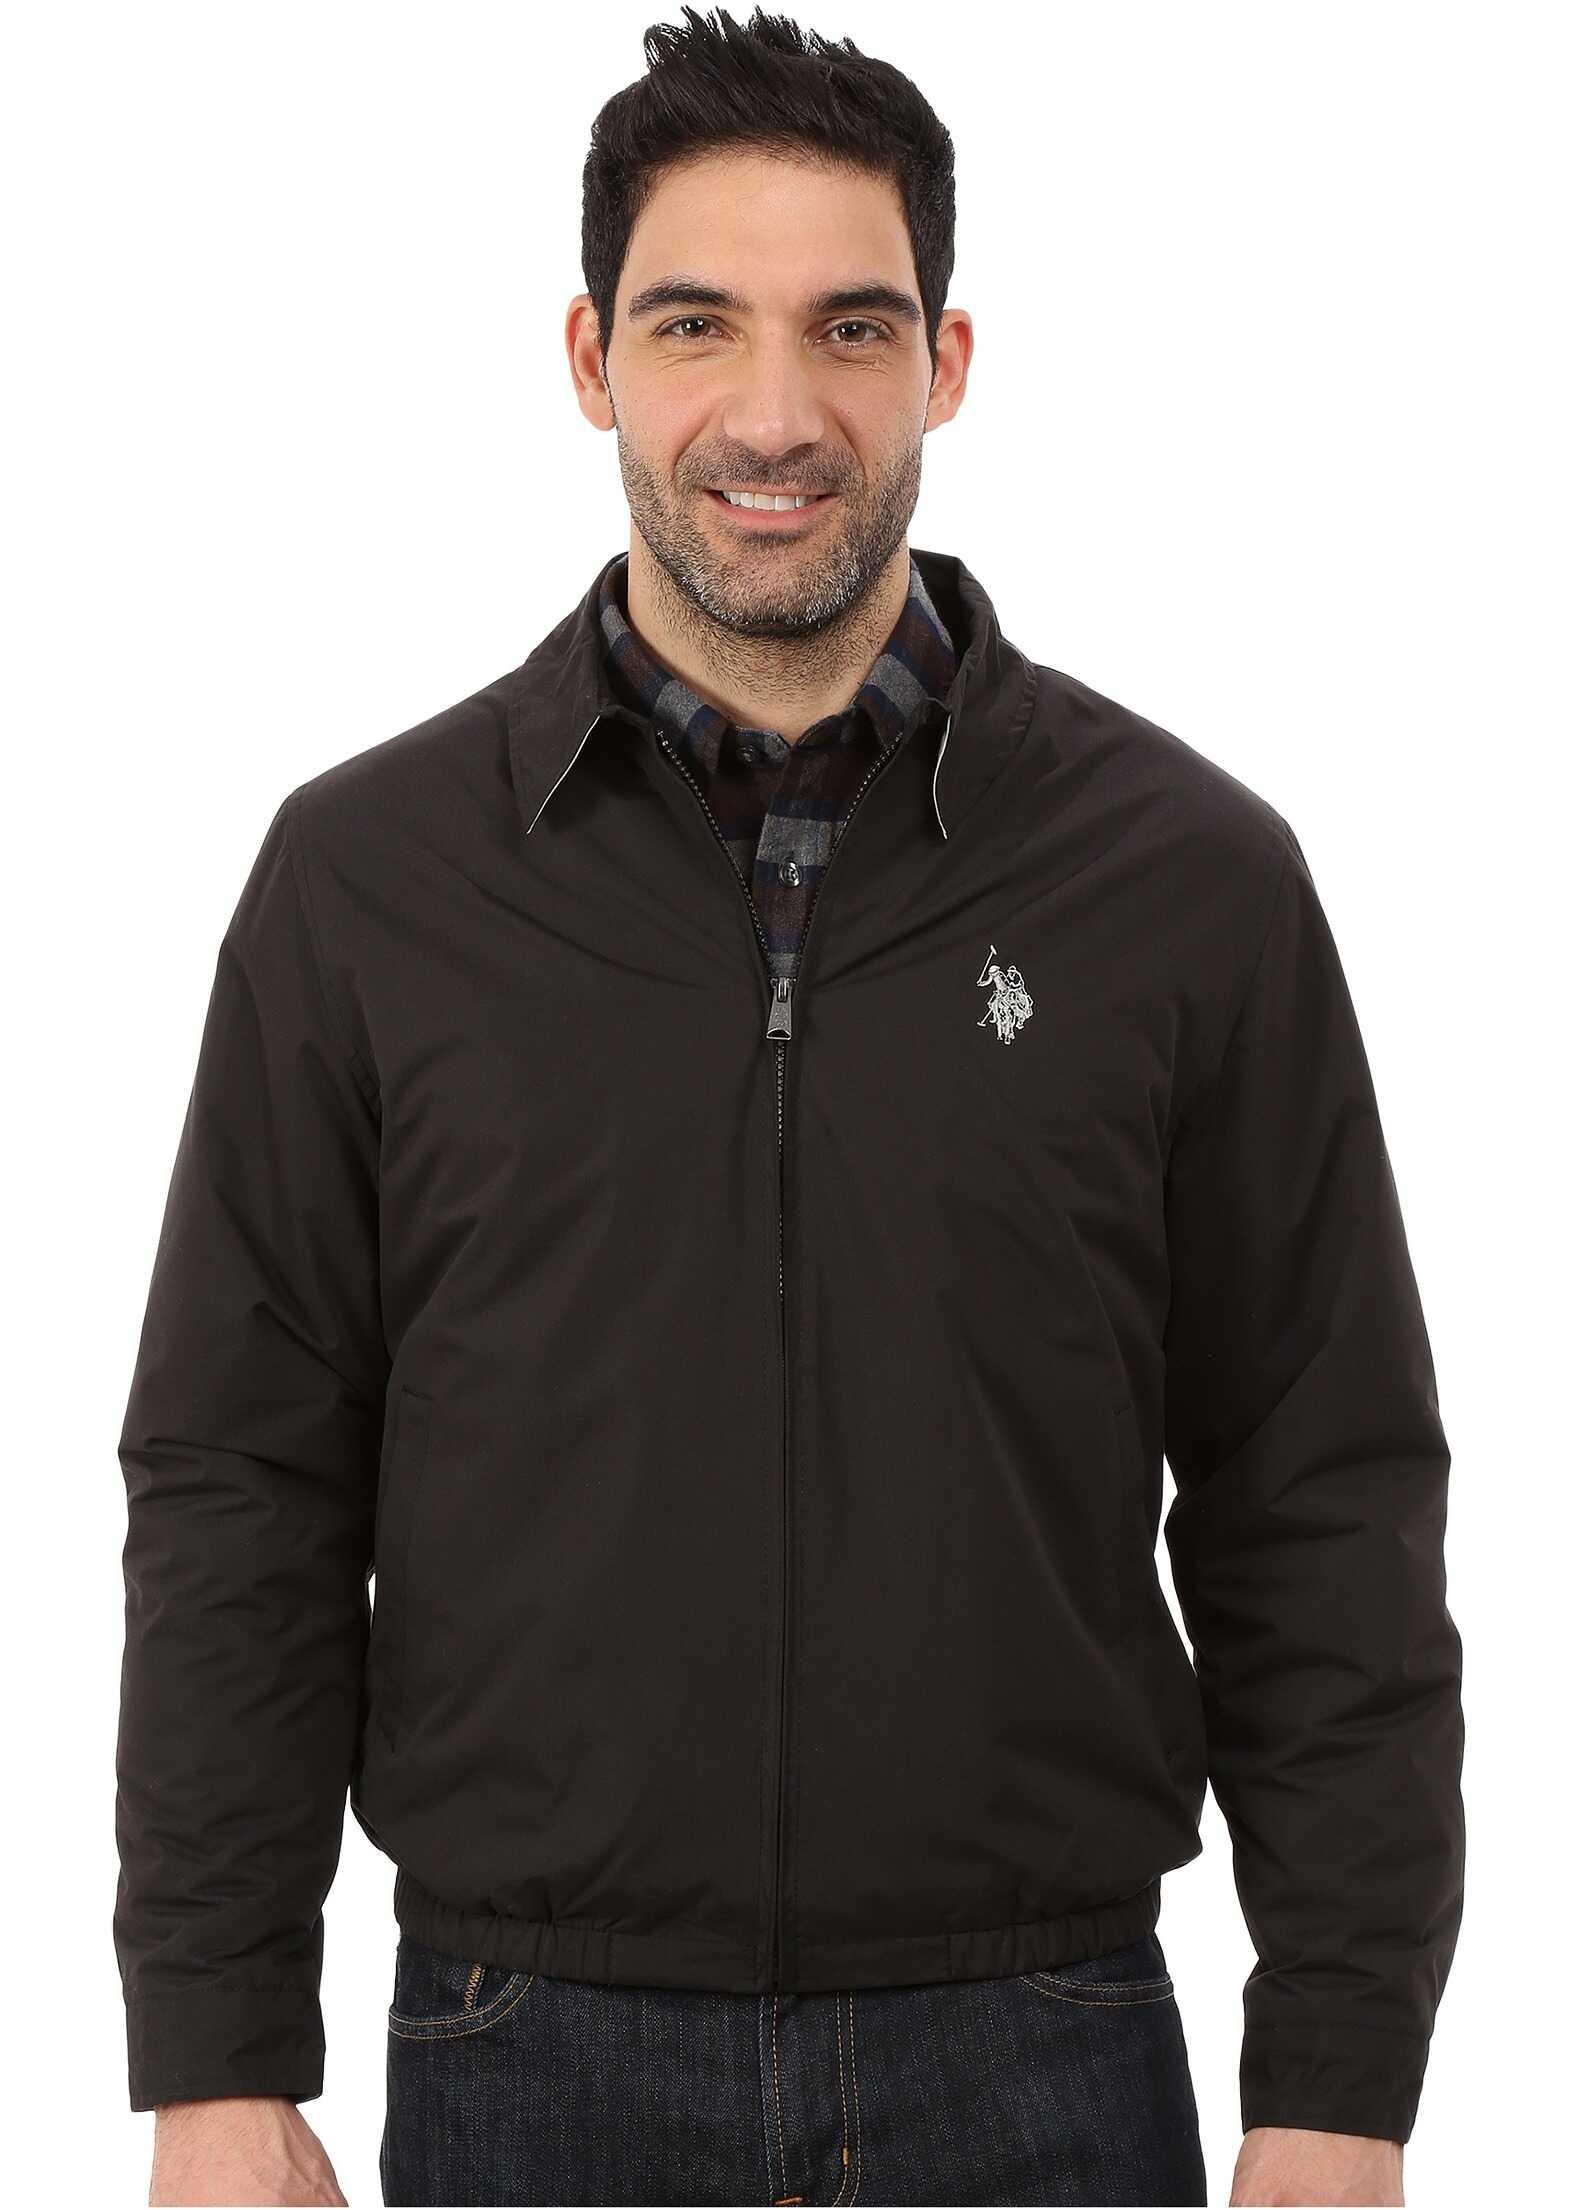 U.S. POLO ASSN. Golf Jacket Black